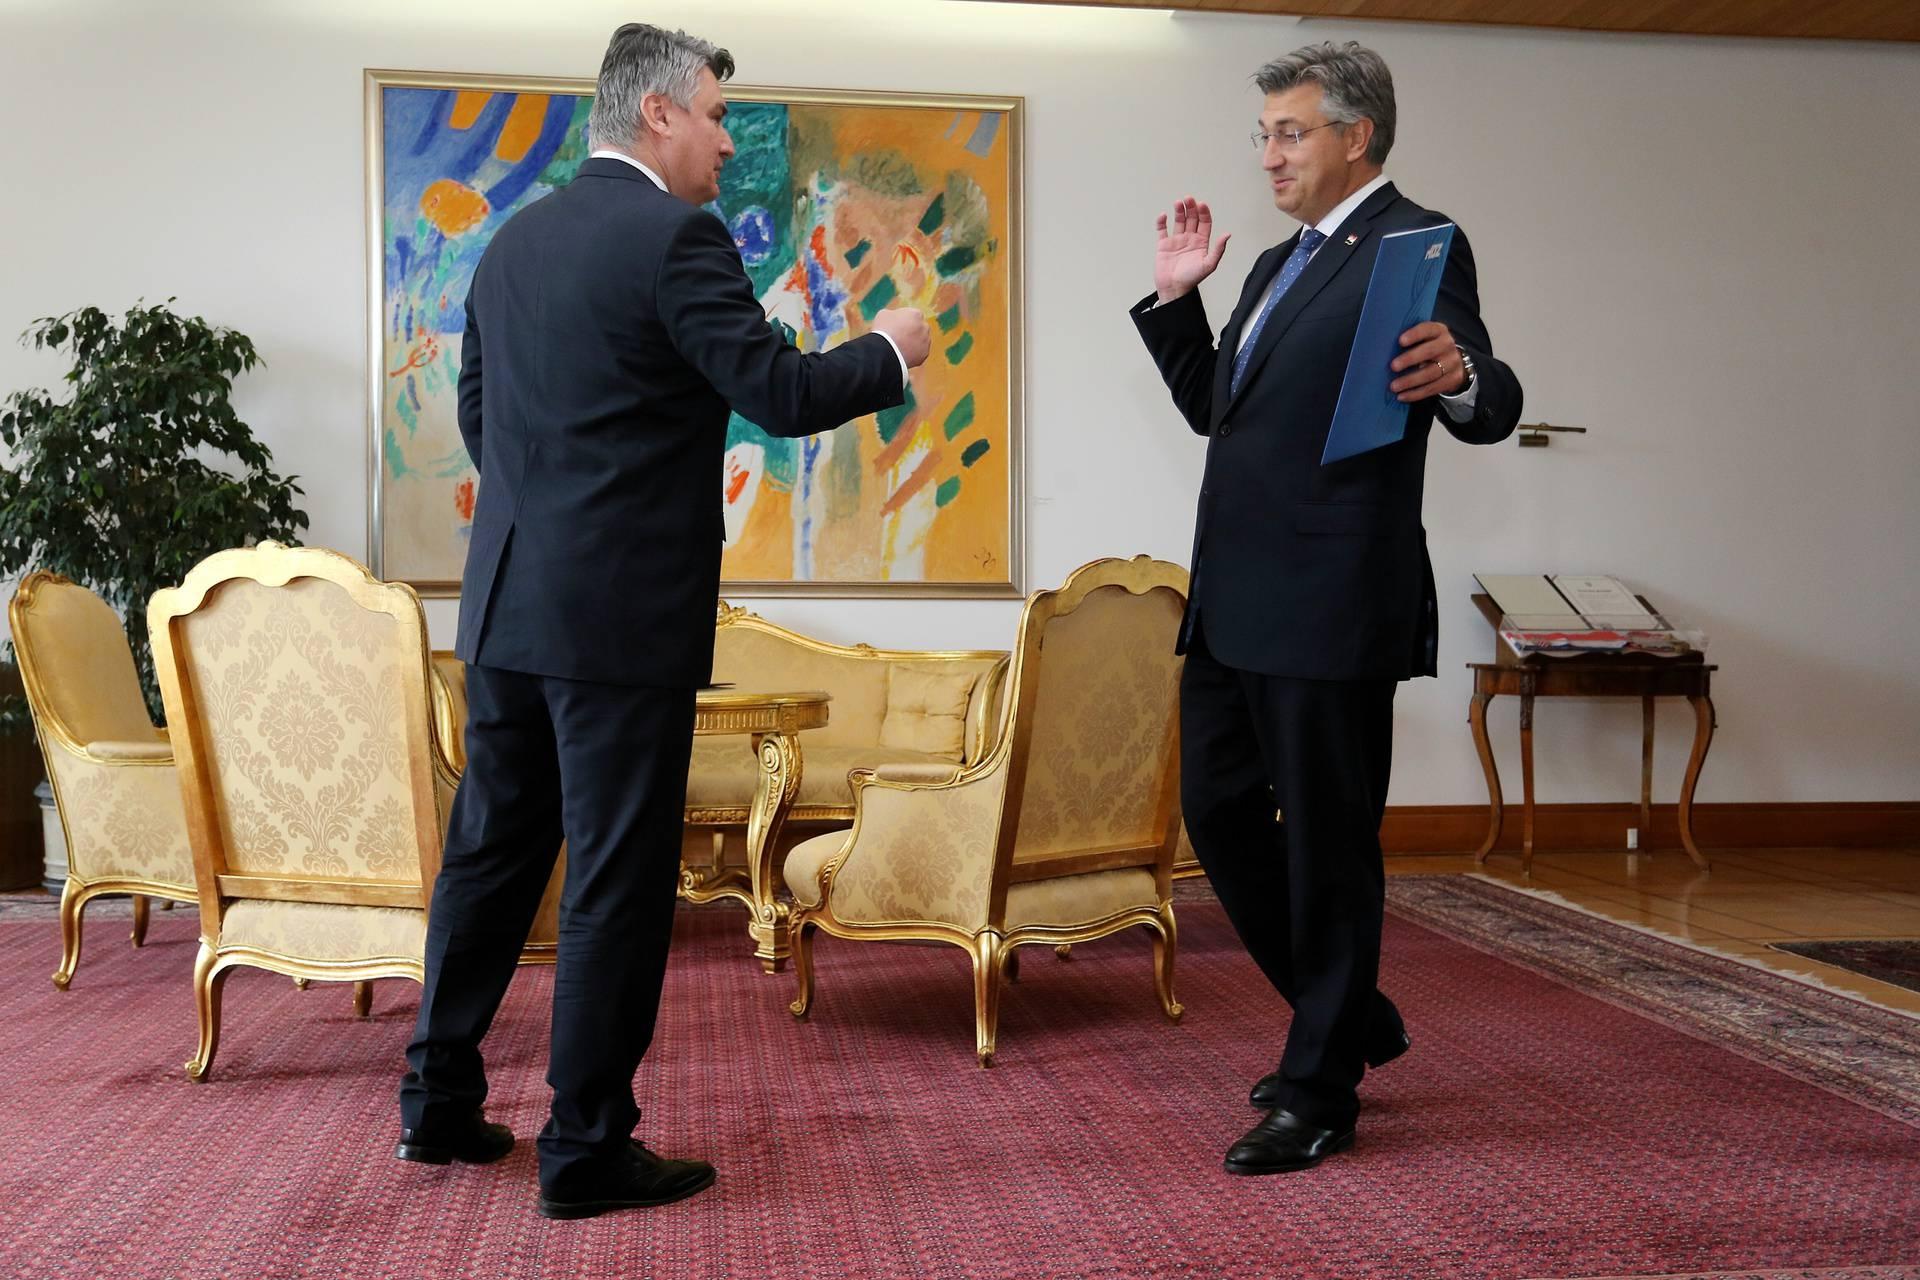 Čuljak i Anušić progurali svoje ljude, Horvat je 'pomilovan'